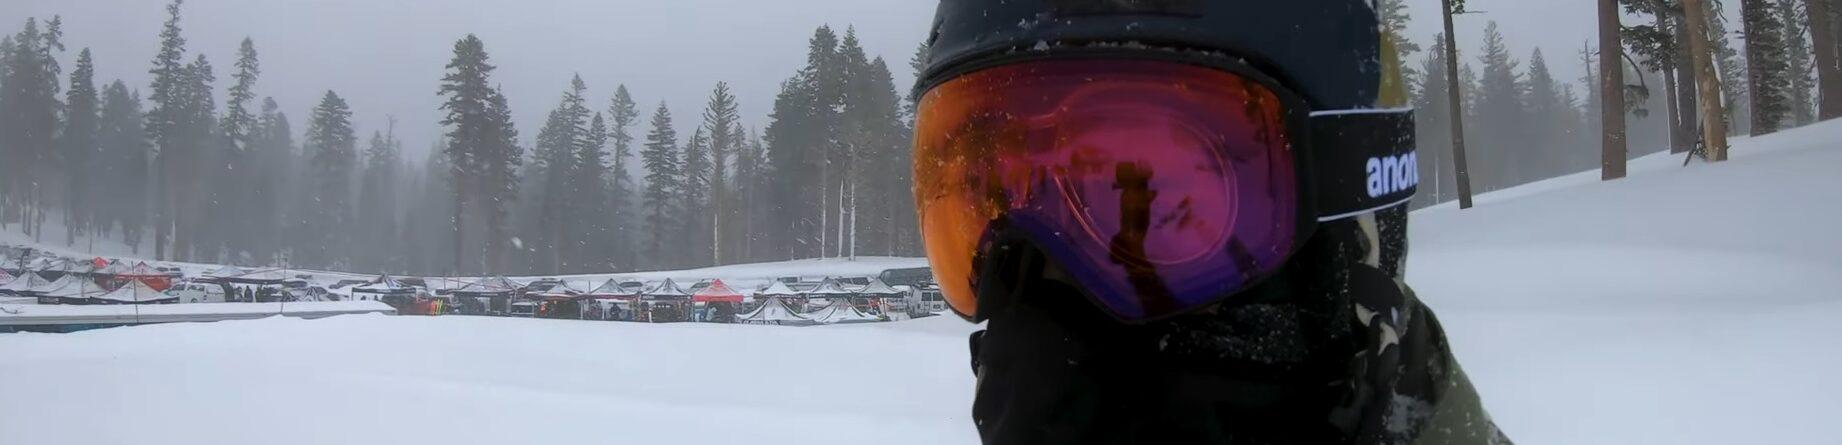 Best Snowboard Goggles